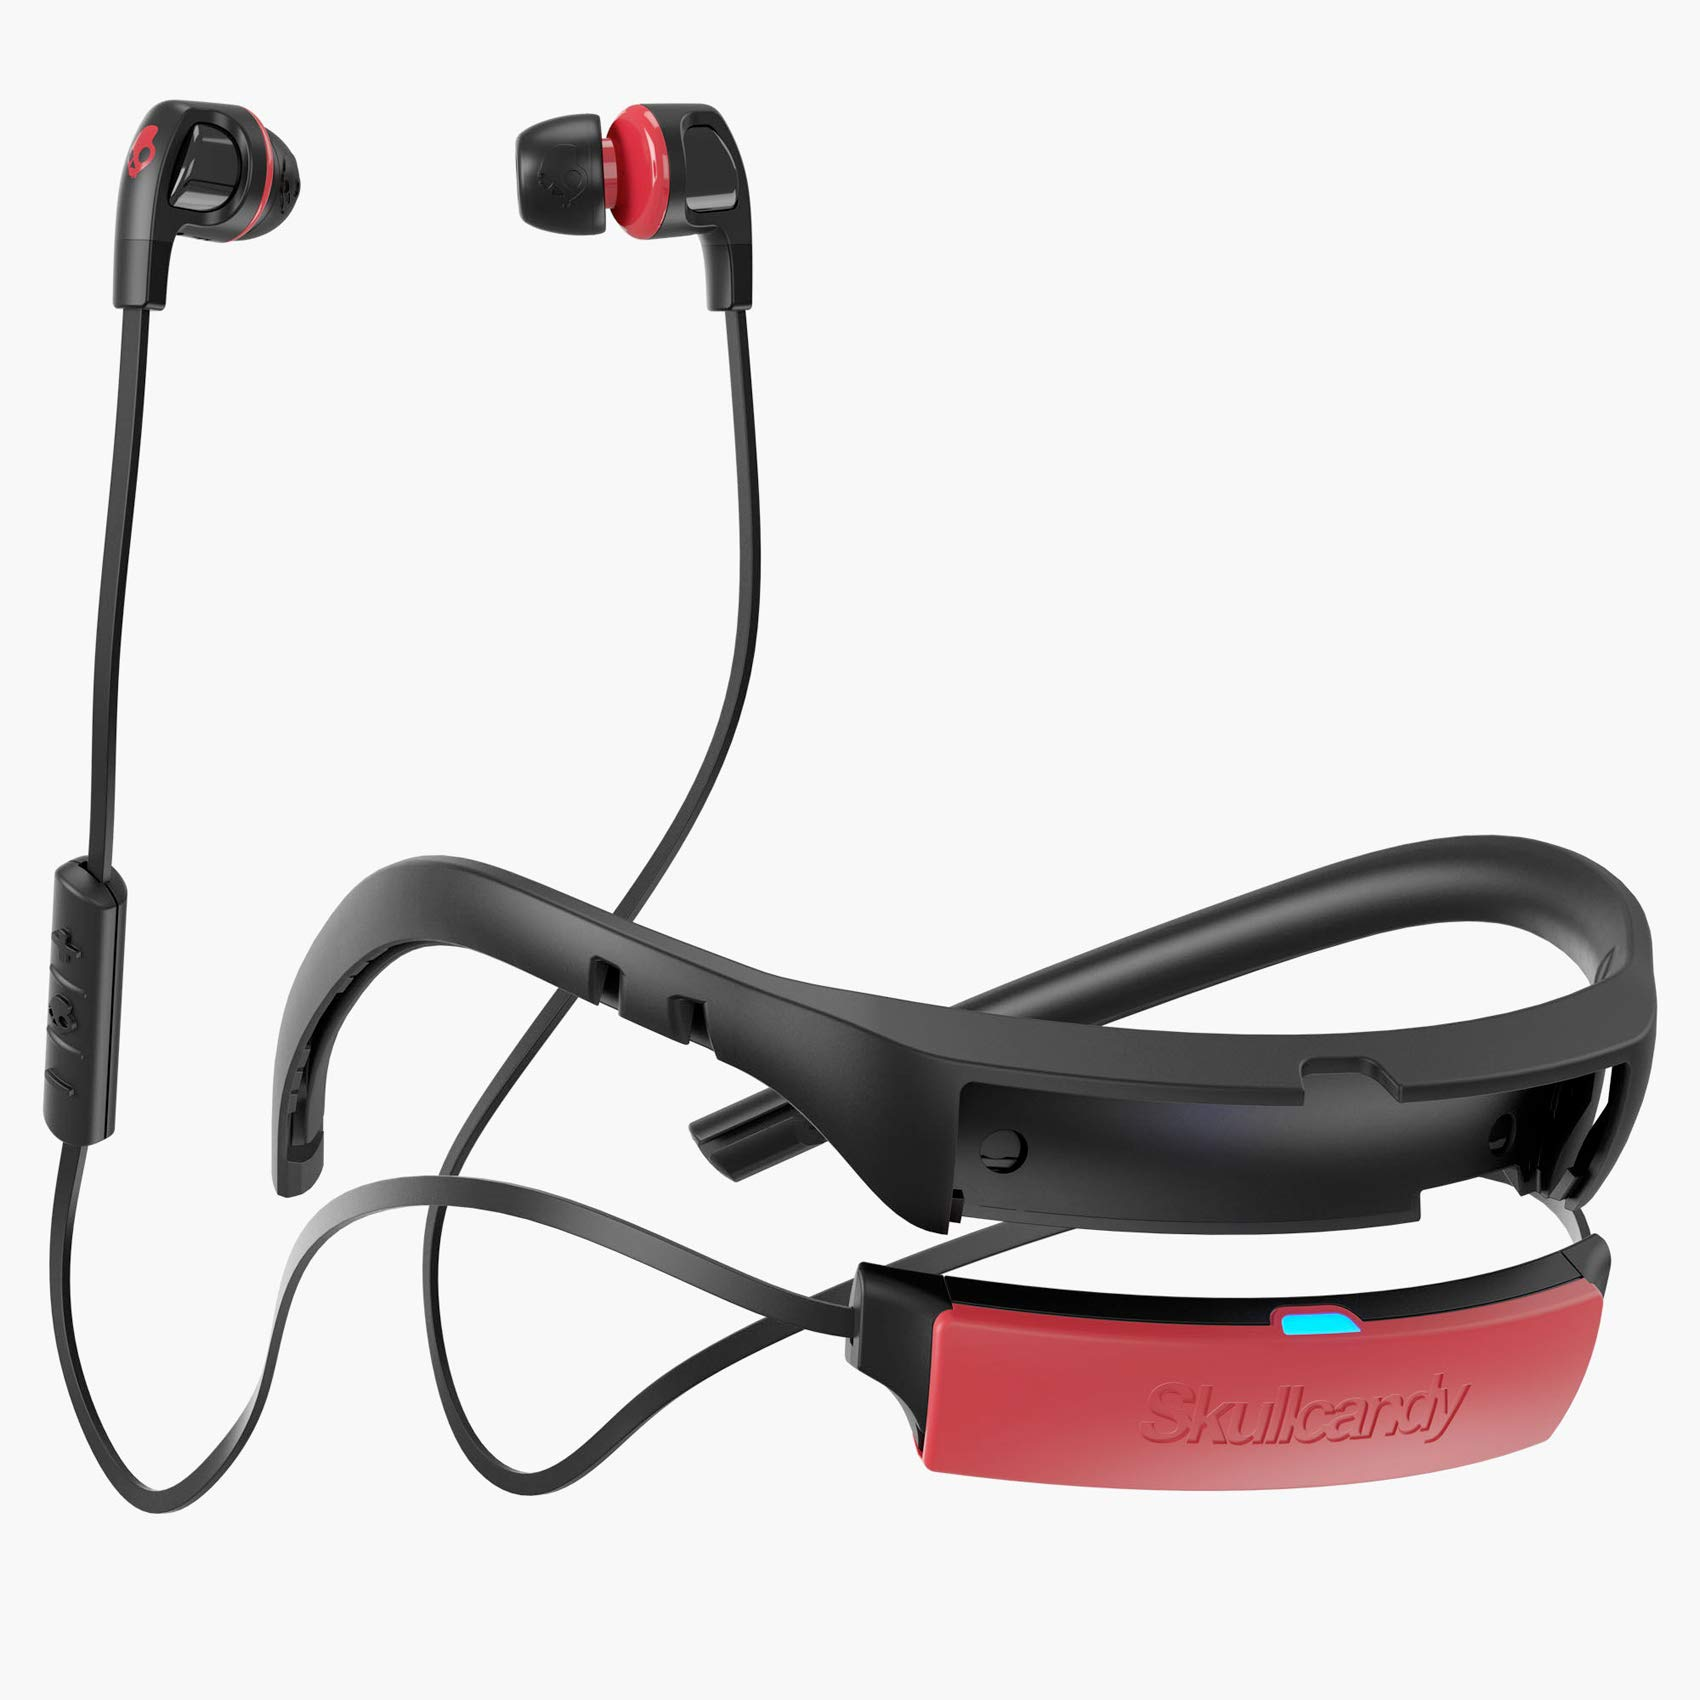 Skullcandy Smokin Buds 2 In Ear Bluetooth Wireless Earbuds Microphone Black Red 878615080294 Ebay